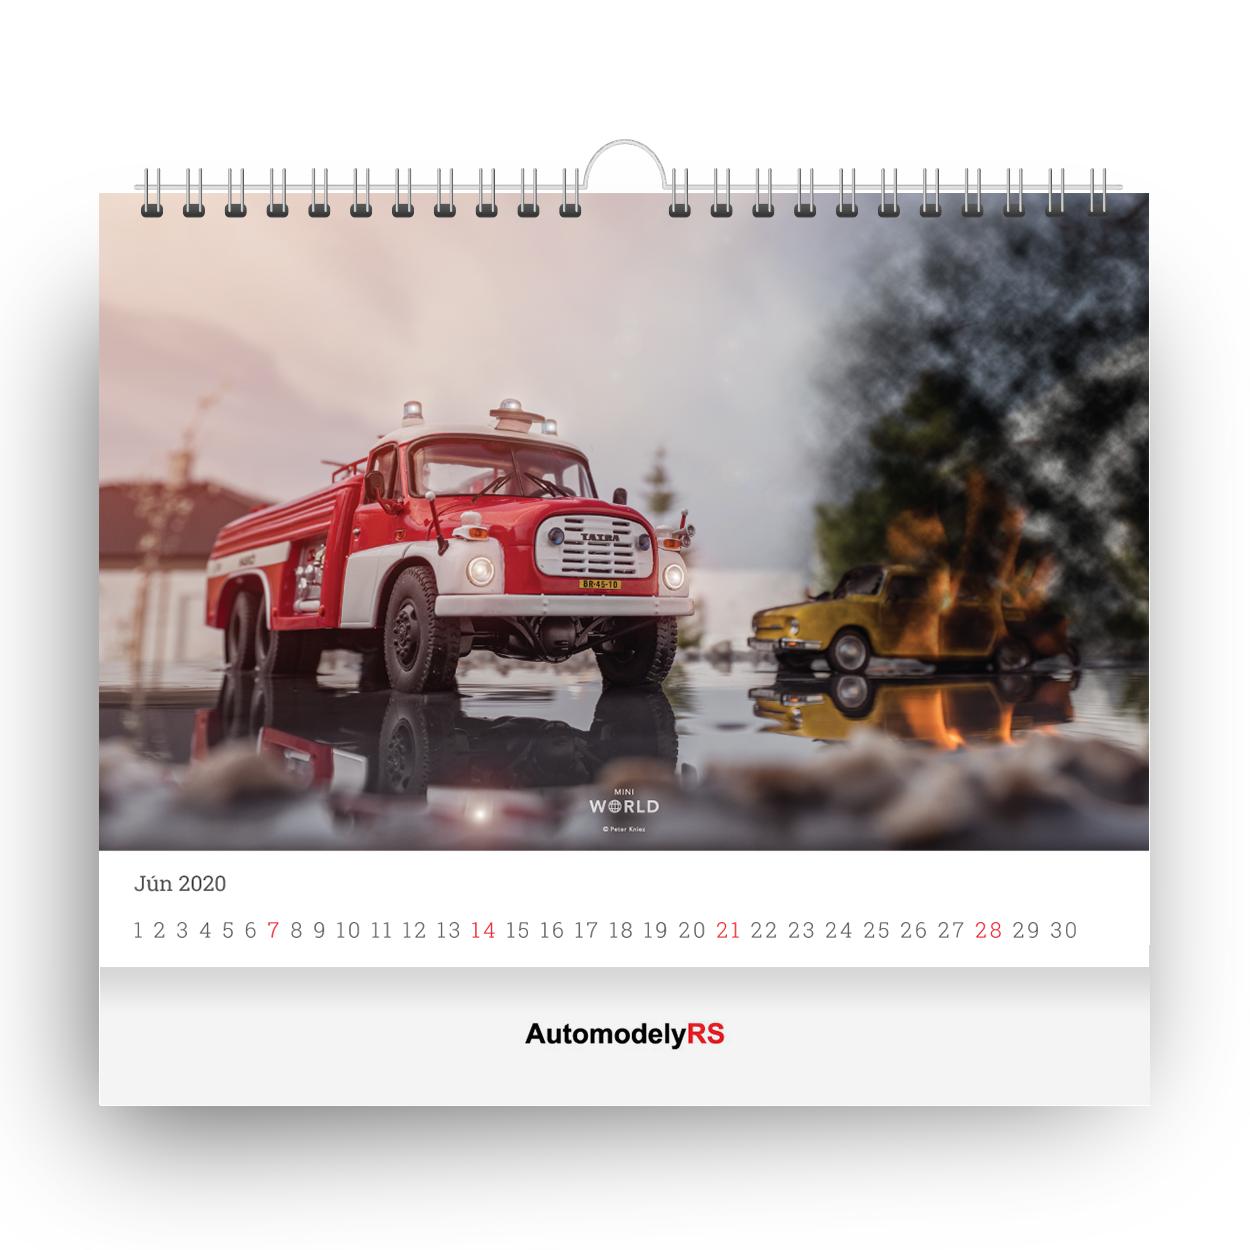 Cardesignworld Na Instagramie 2020 Tesla Roadster: Kalendár Mini World 2020 Hasiči